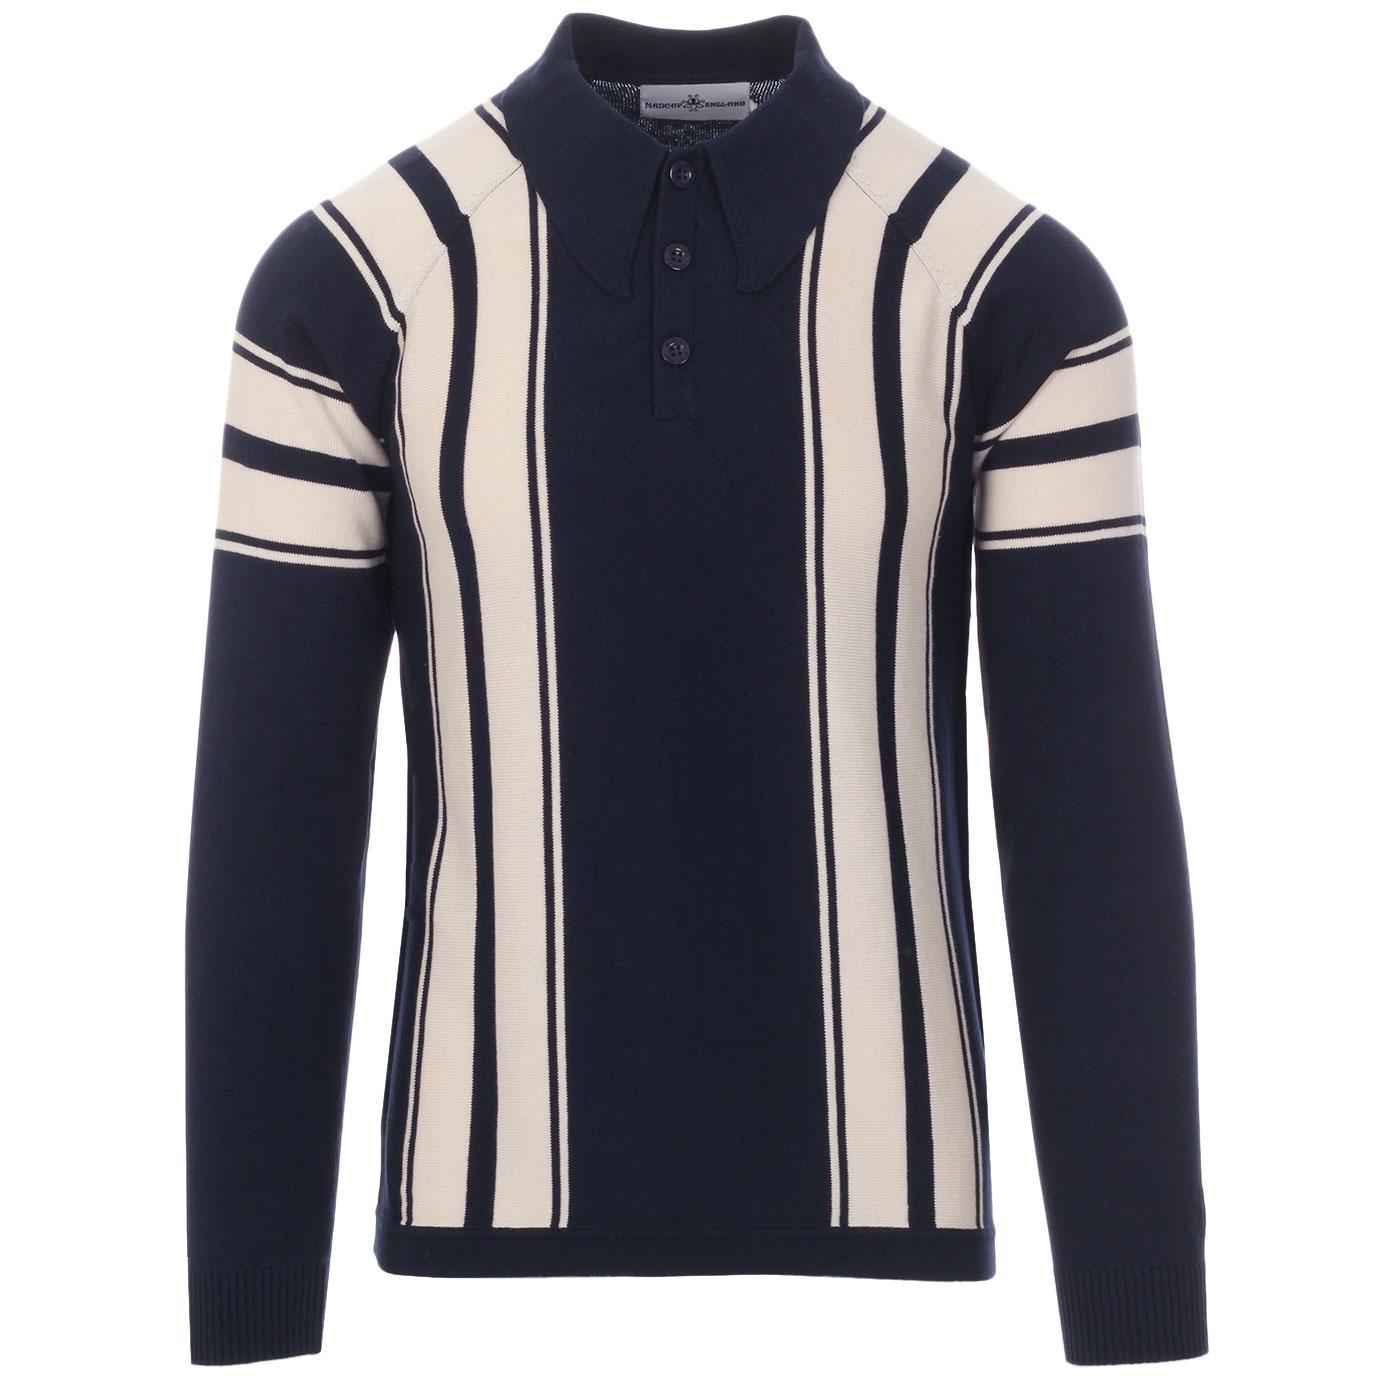 Madcap England Acid Test Men's Retro Mod Long Sleeve Stripe Big Collar Polo Top